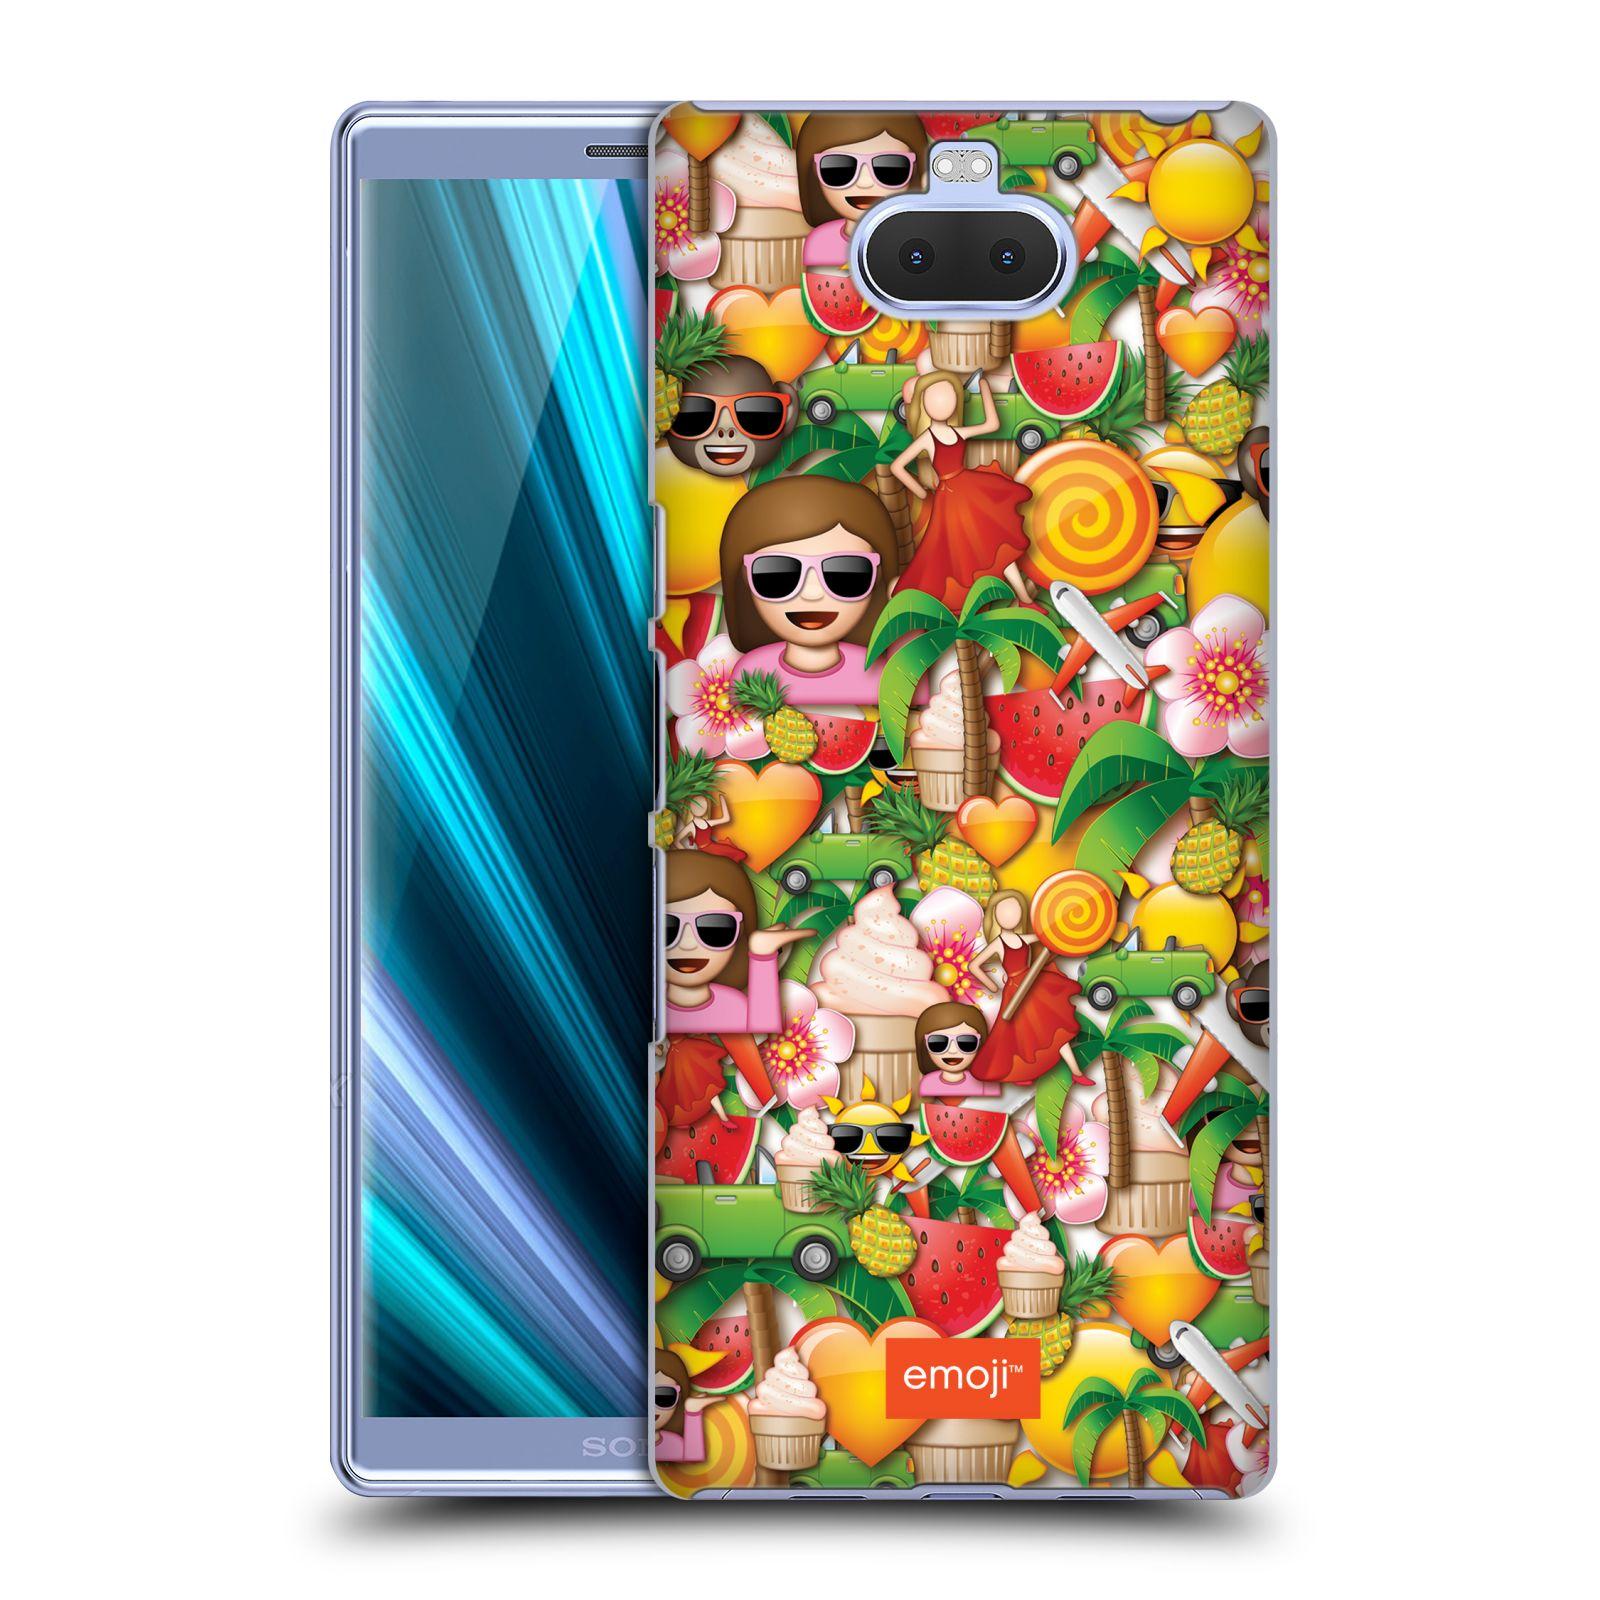 Pouzdro na mobil Sony Xperia 10 Plus - Head Case - smajlíci oficiální kryt EMOJI vzor smajlící a léto